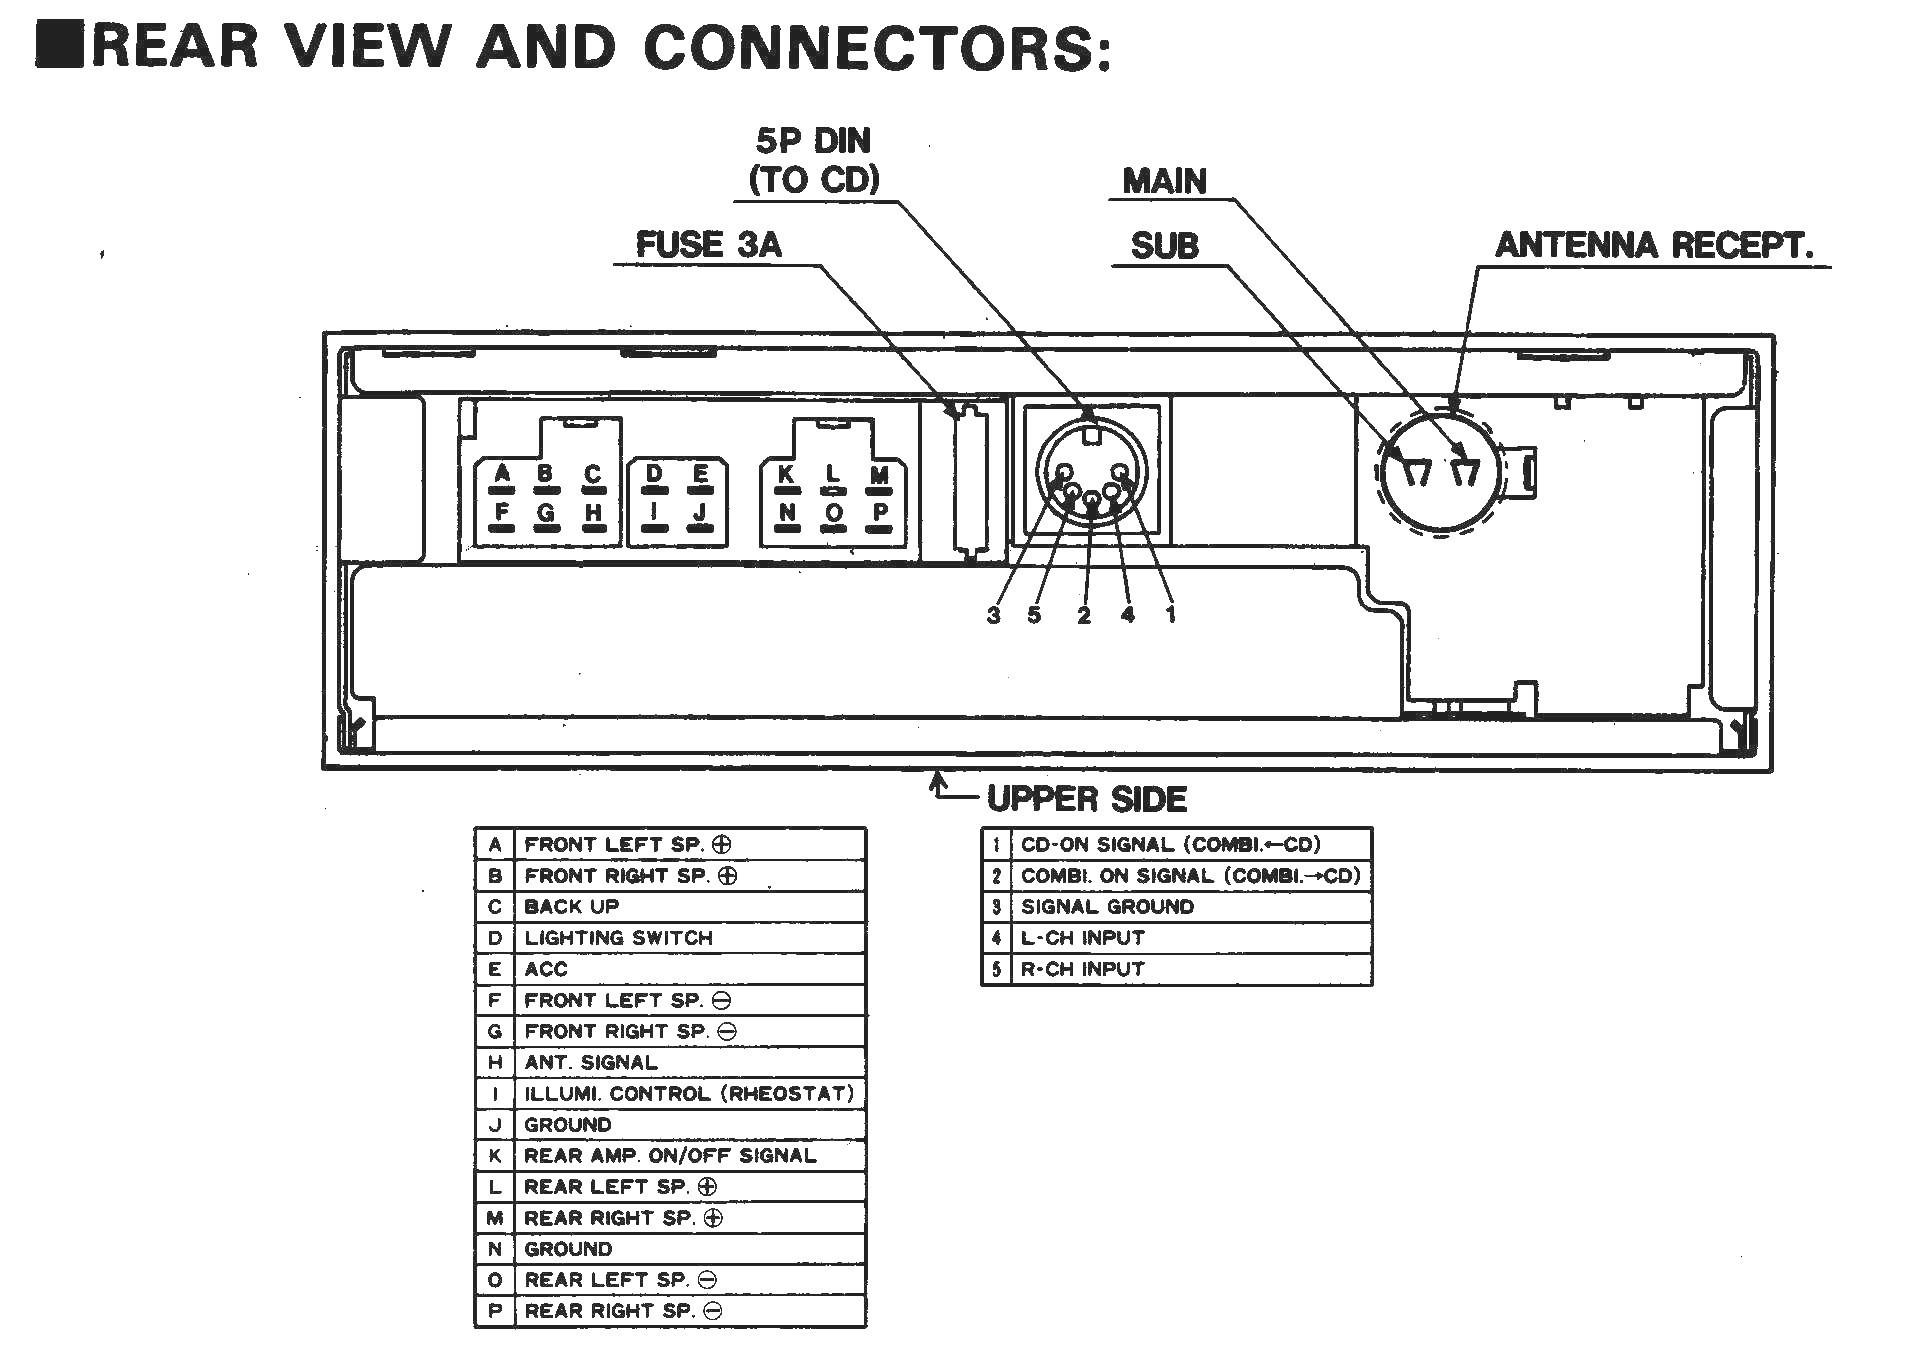 kenwood radio wiring diagram luxury car kdc stereo harness rh dealpronetwork 2 Channel Amp Wiring Diagram 6 Channel Amp Wiring Diagram